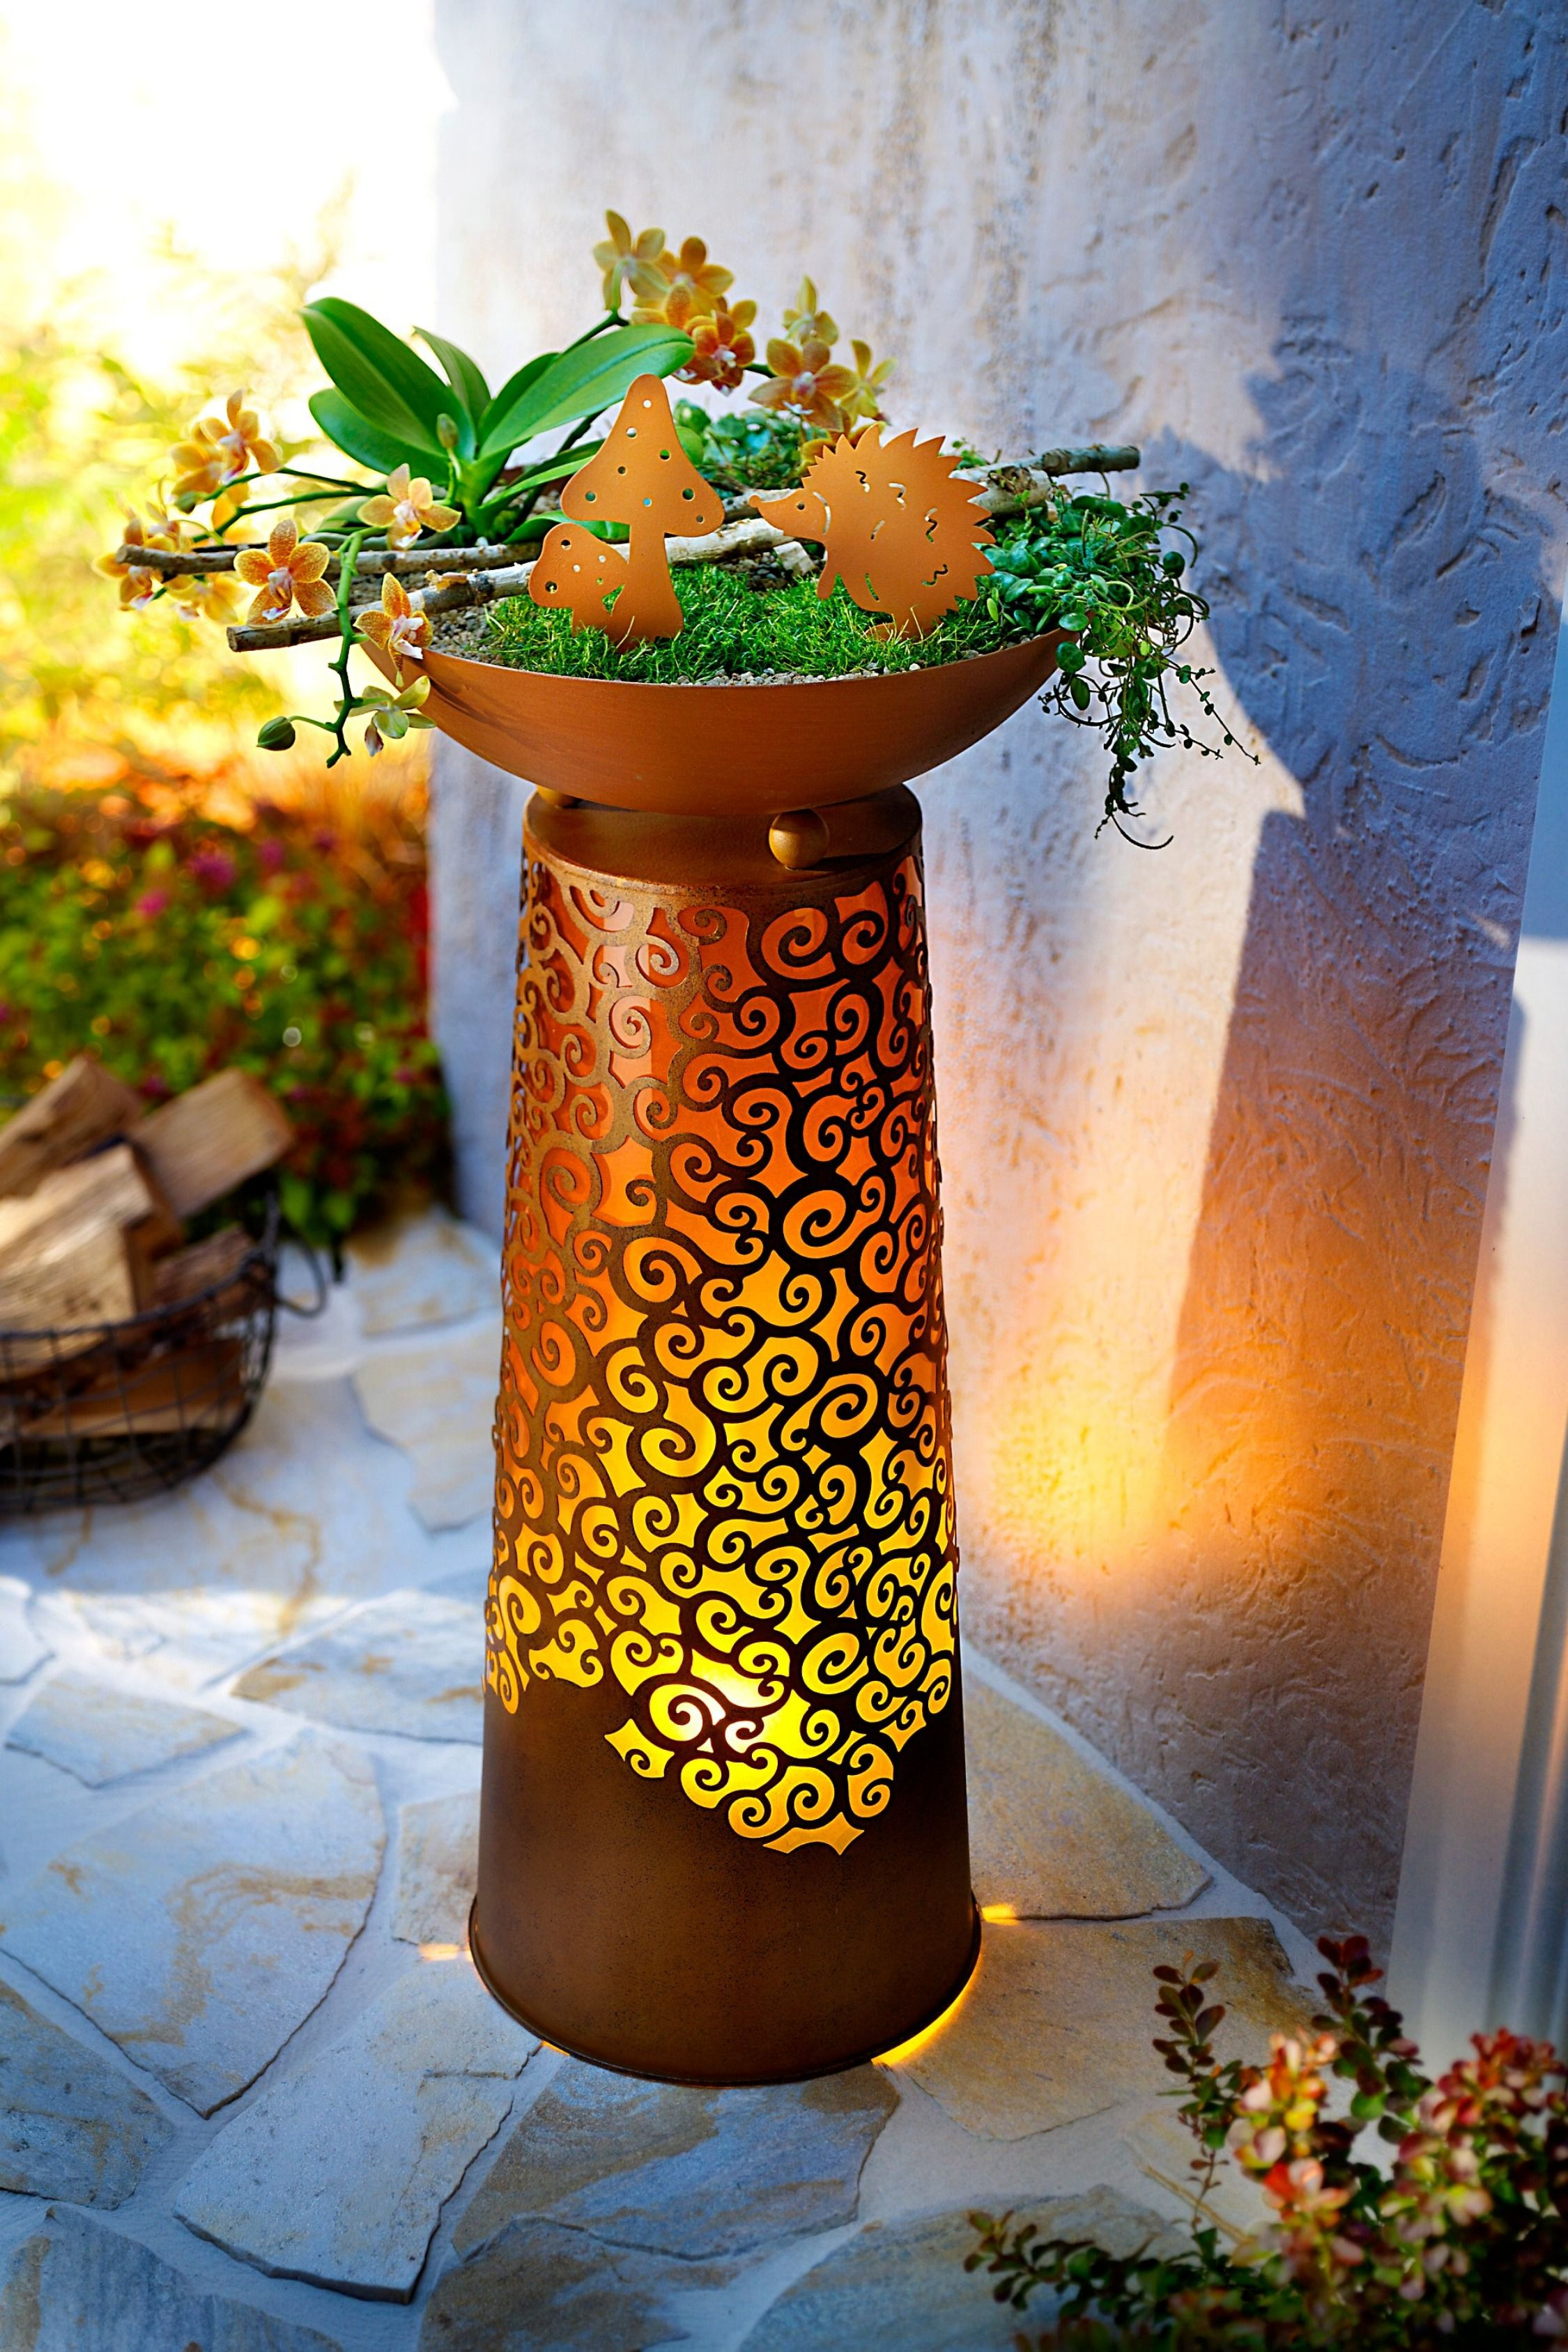 Pflanzsaule Chiara Mit Led Flammenbeleuchtung Weltbild De Pflanzensaule Pflanzen Led